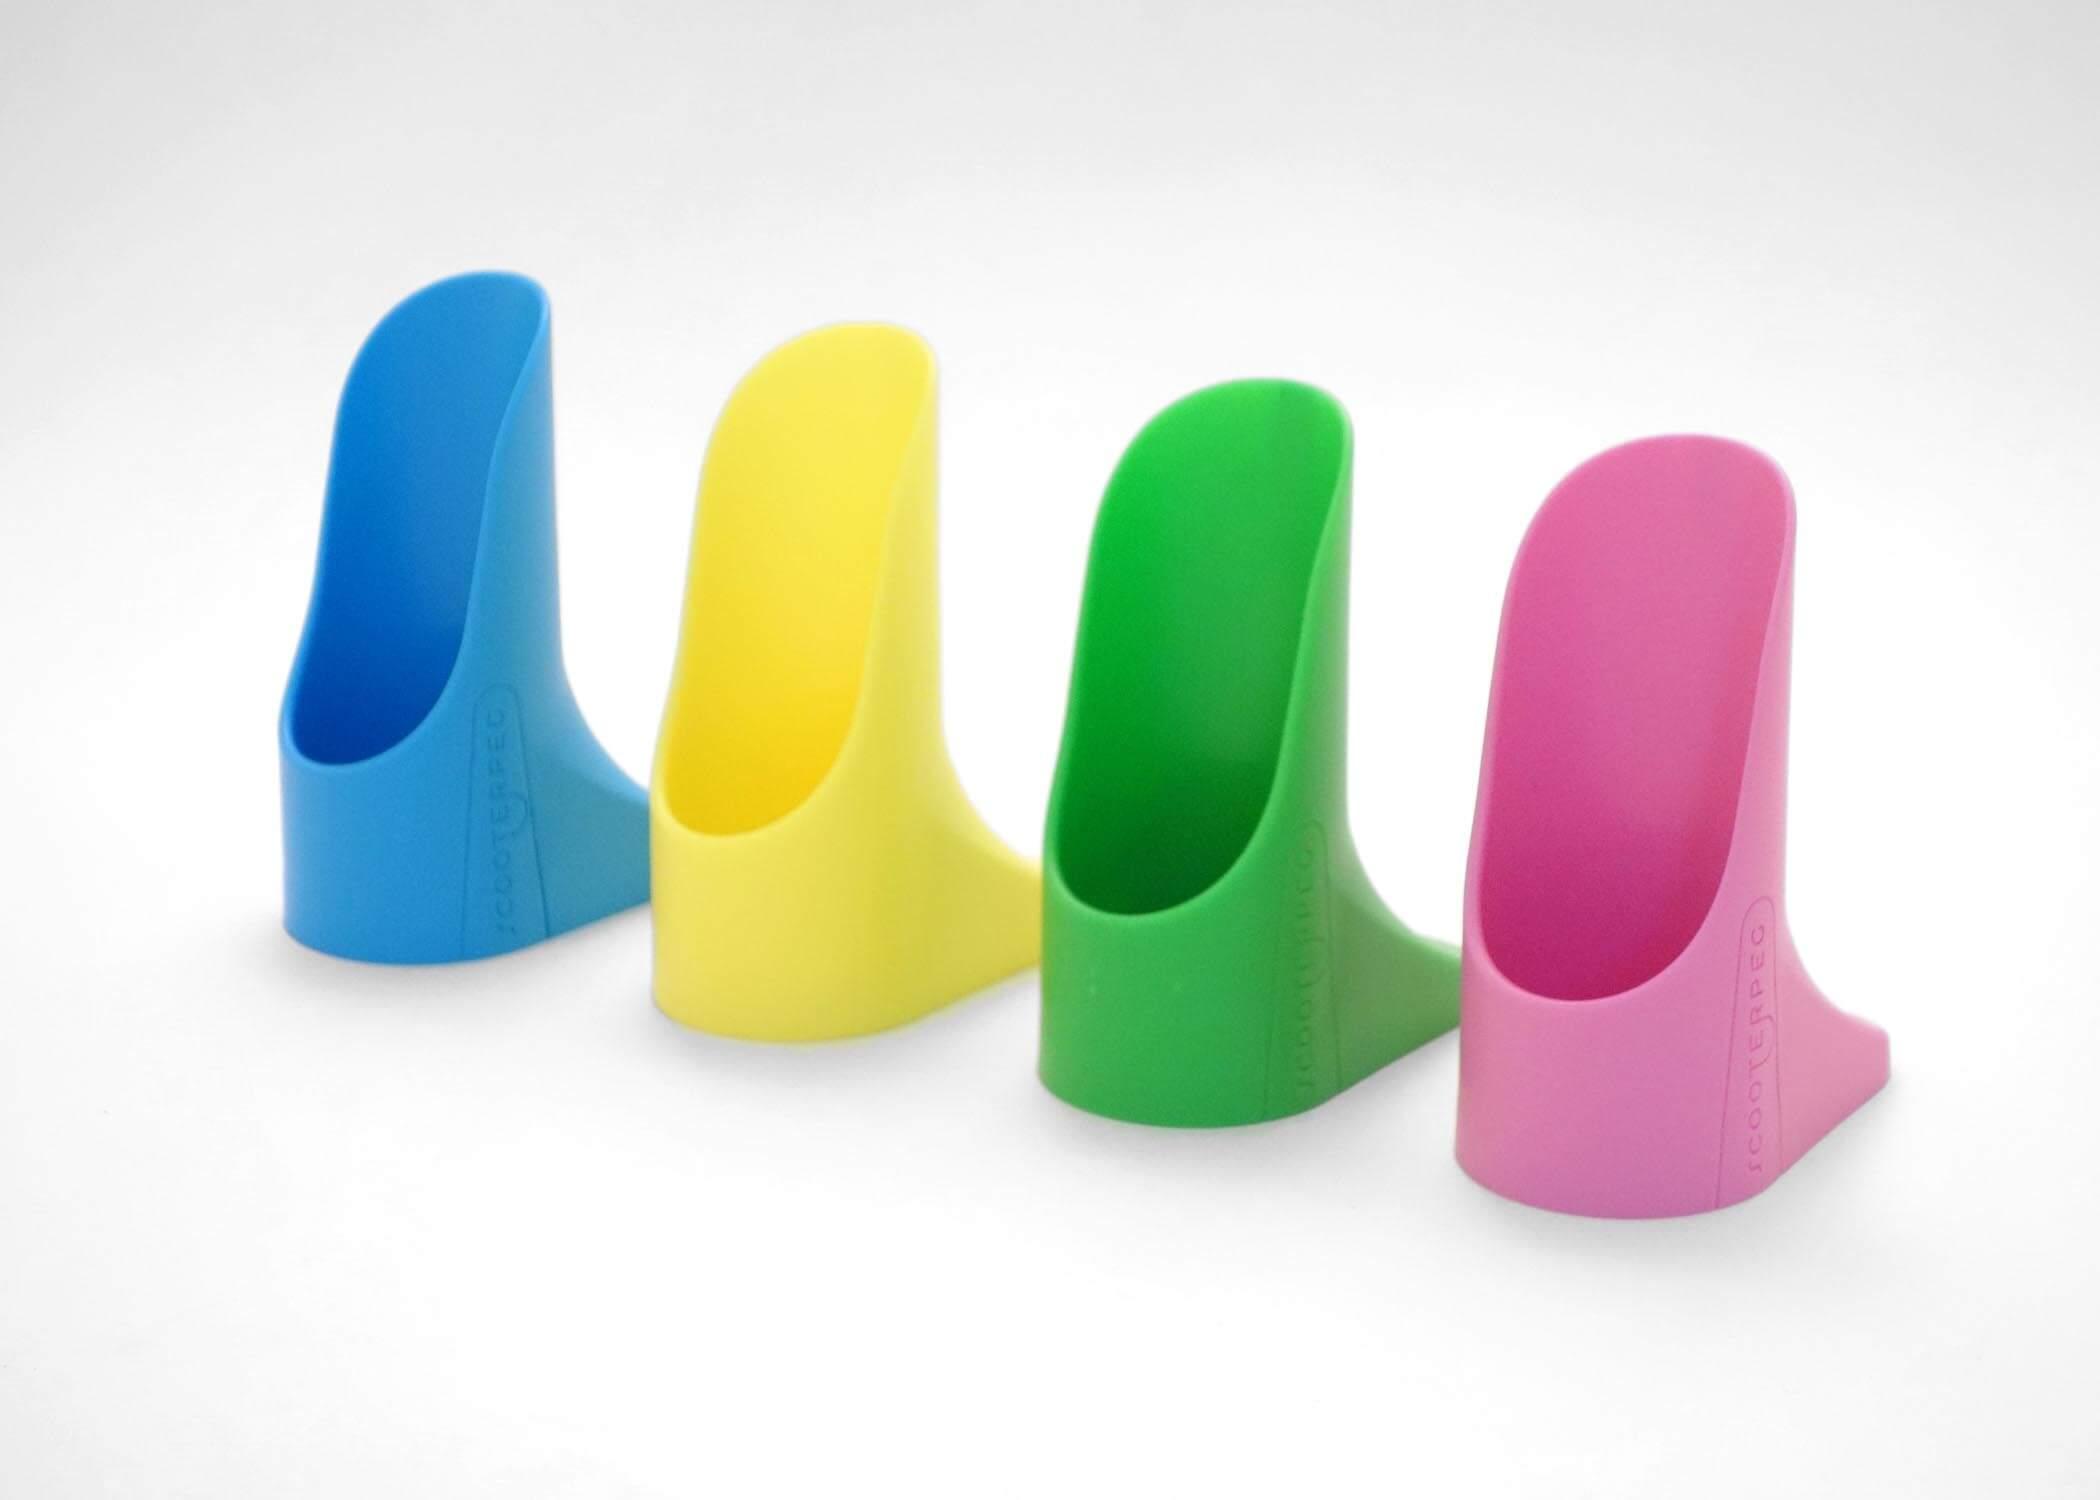 Scooterpeg kids product design manufacture